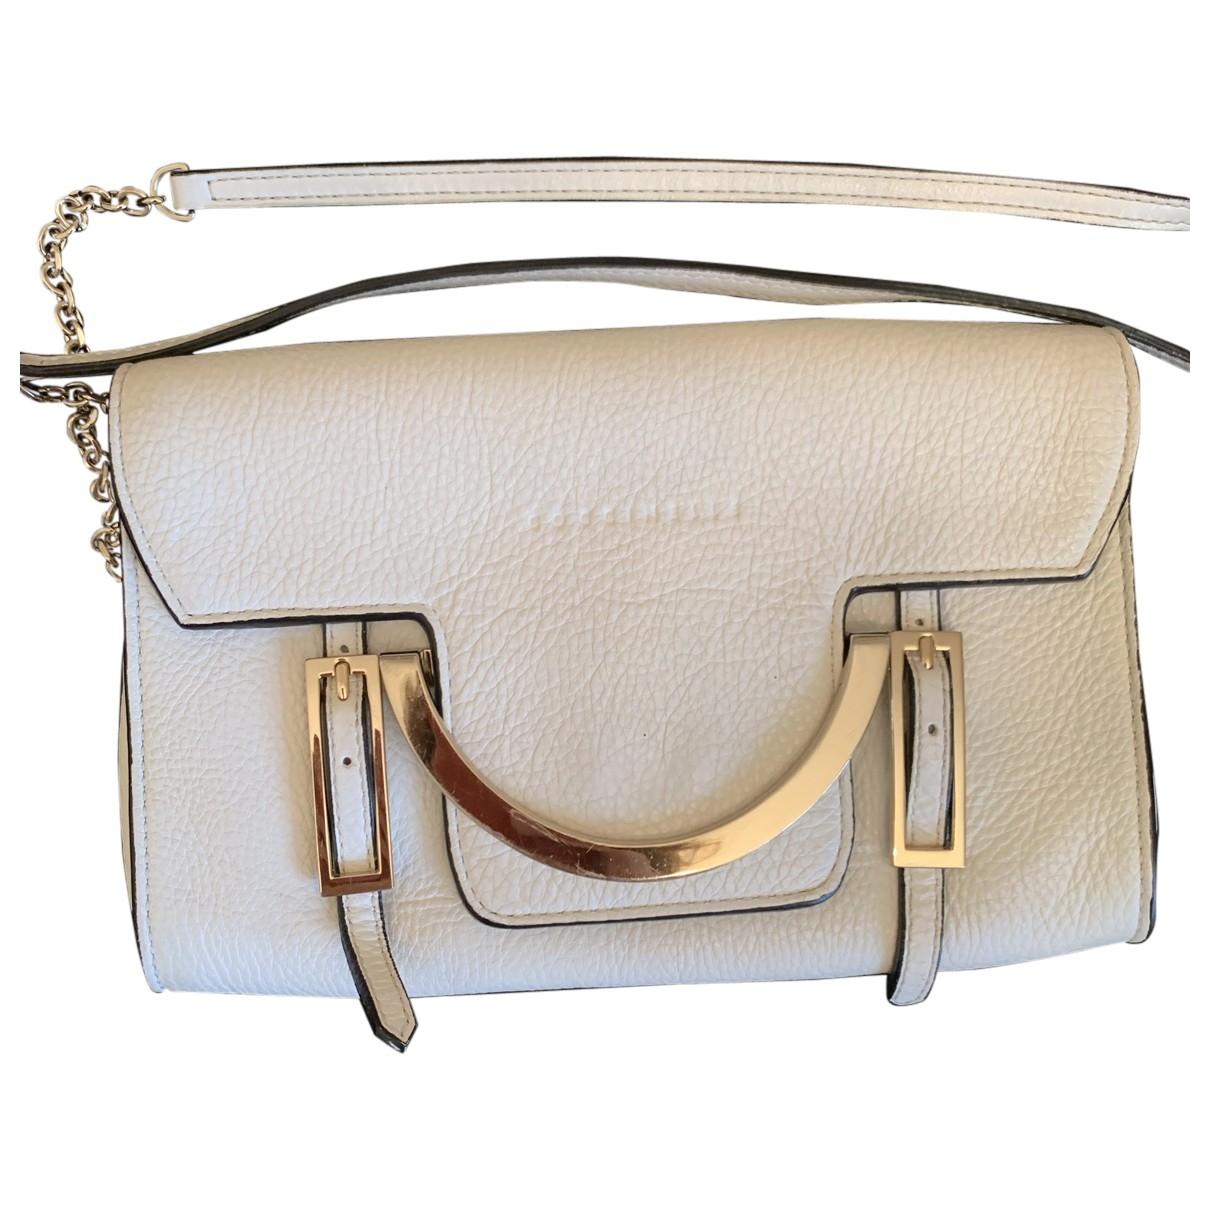 Coccinelle \N White Leather handbag for Women \N